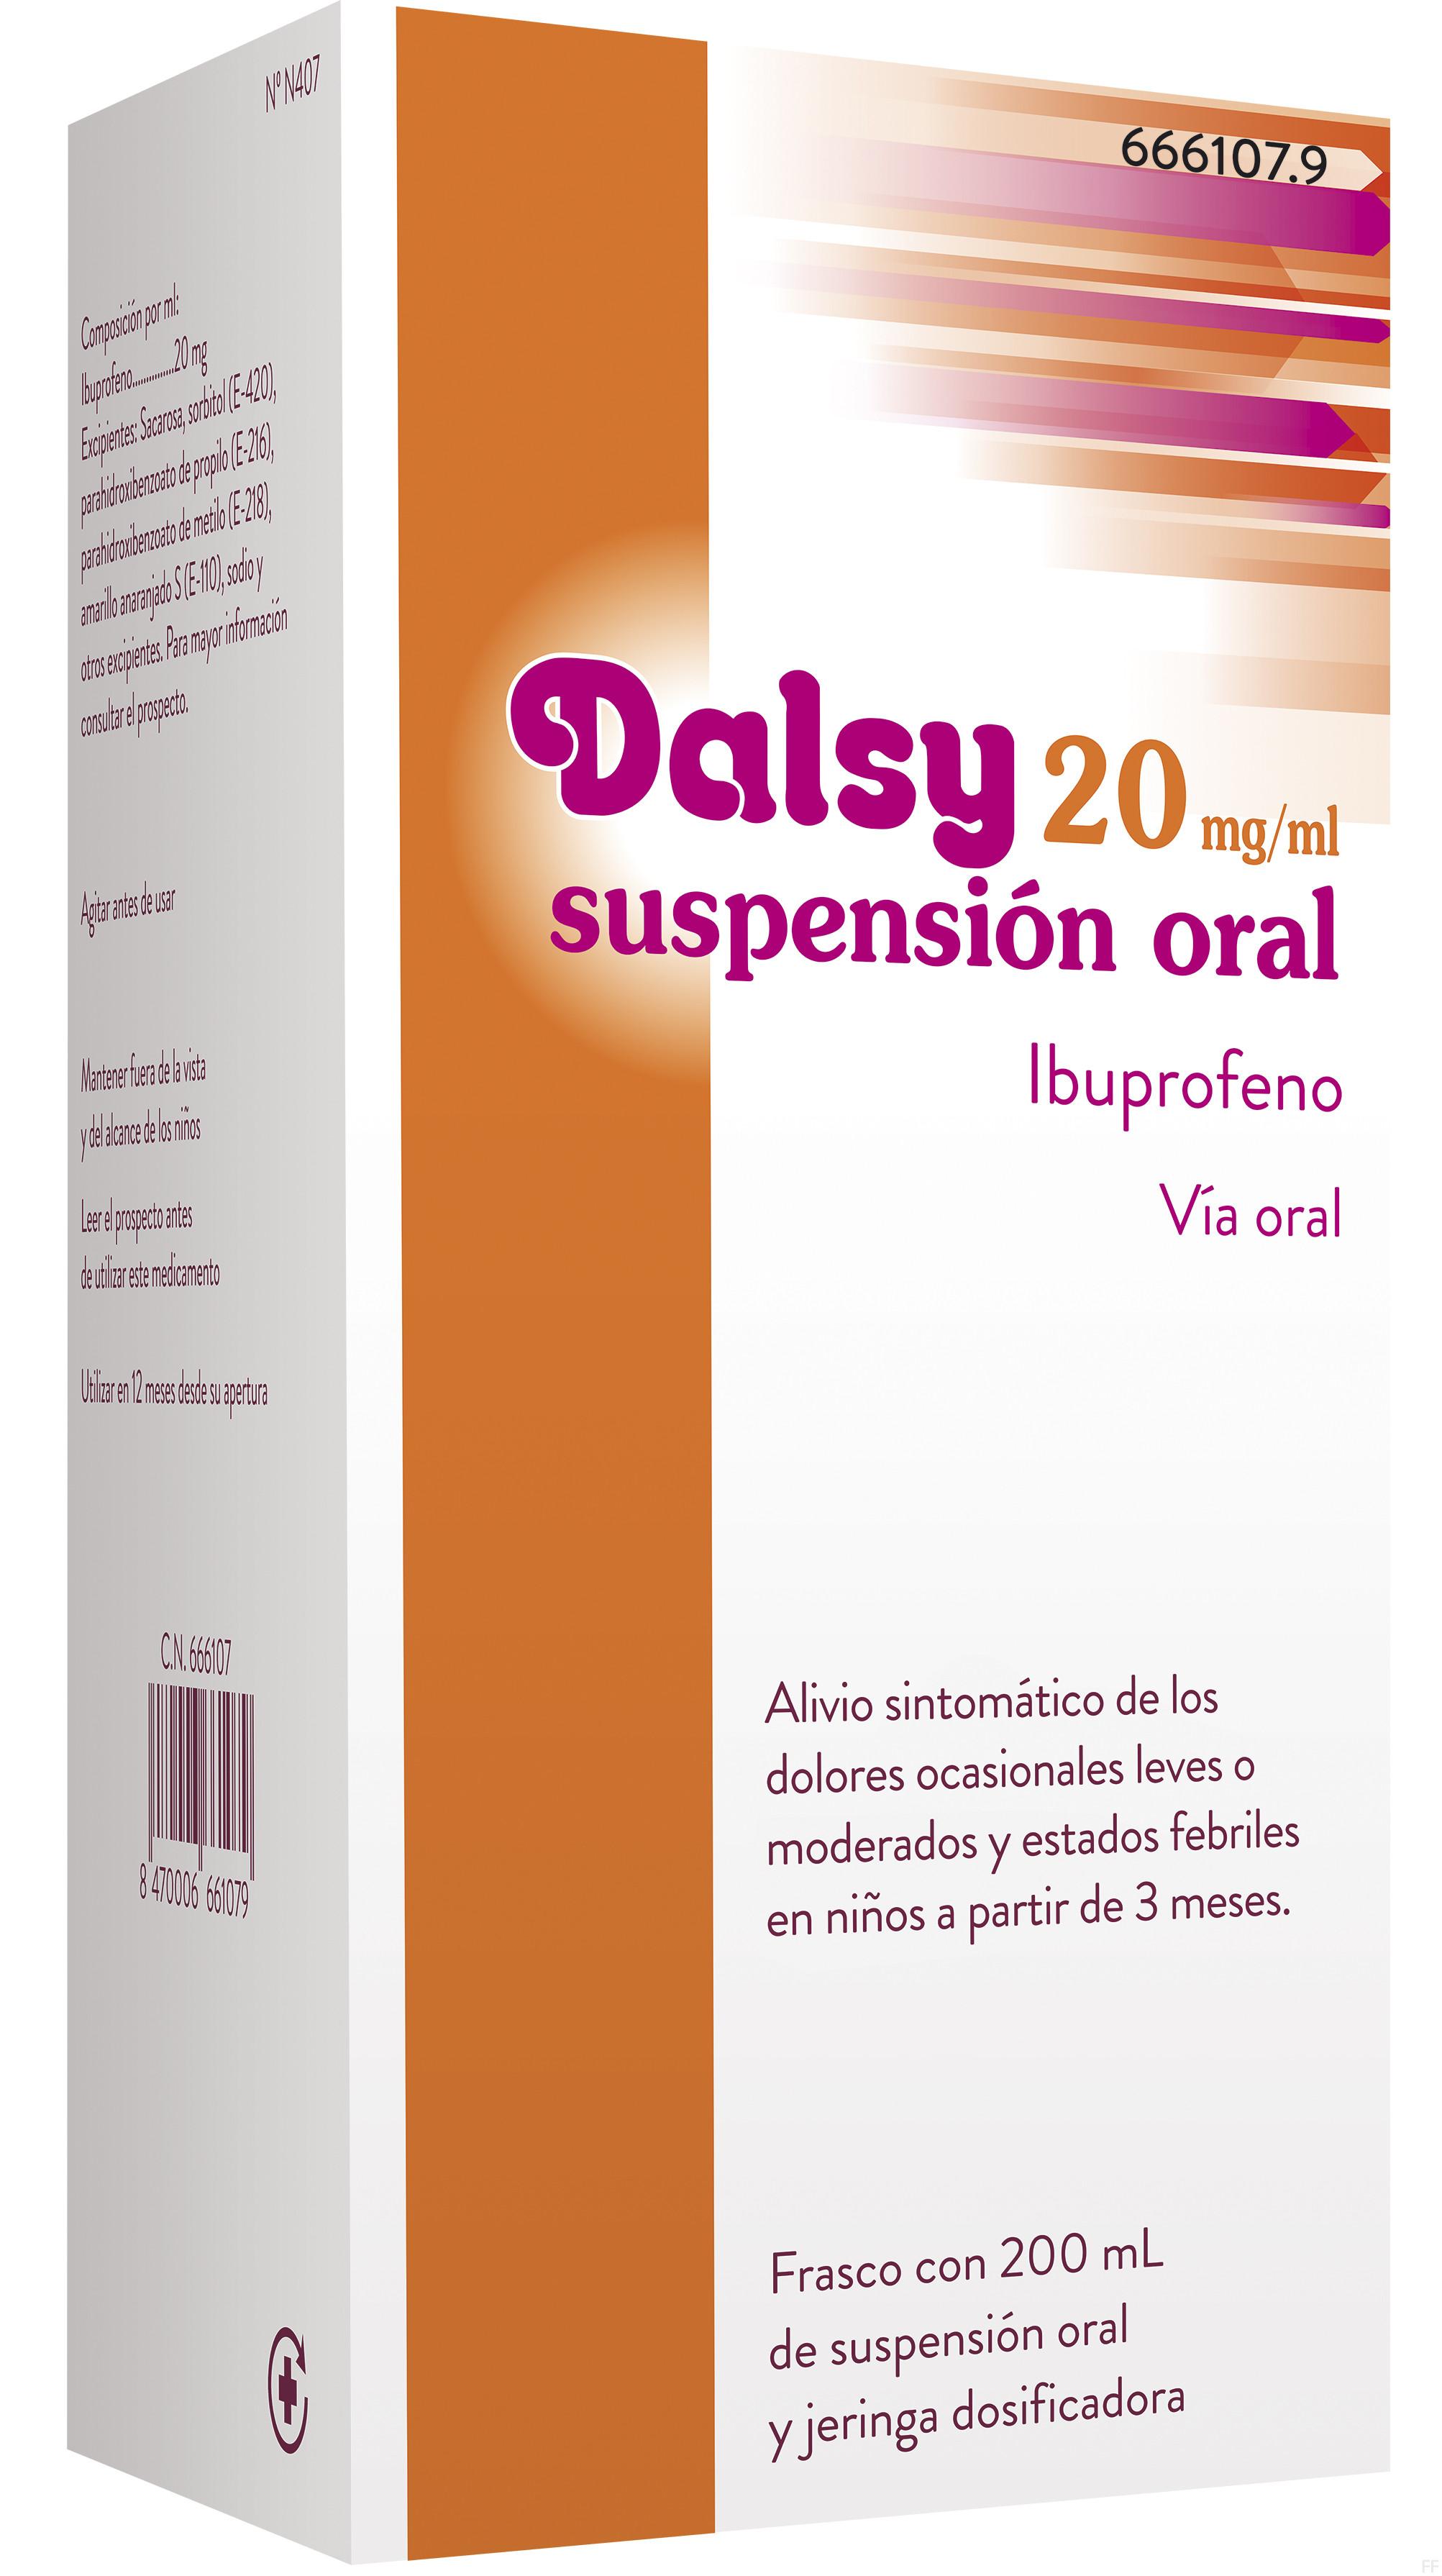 Dalsy 20 mg/ml